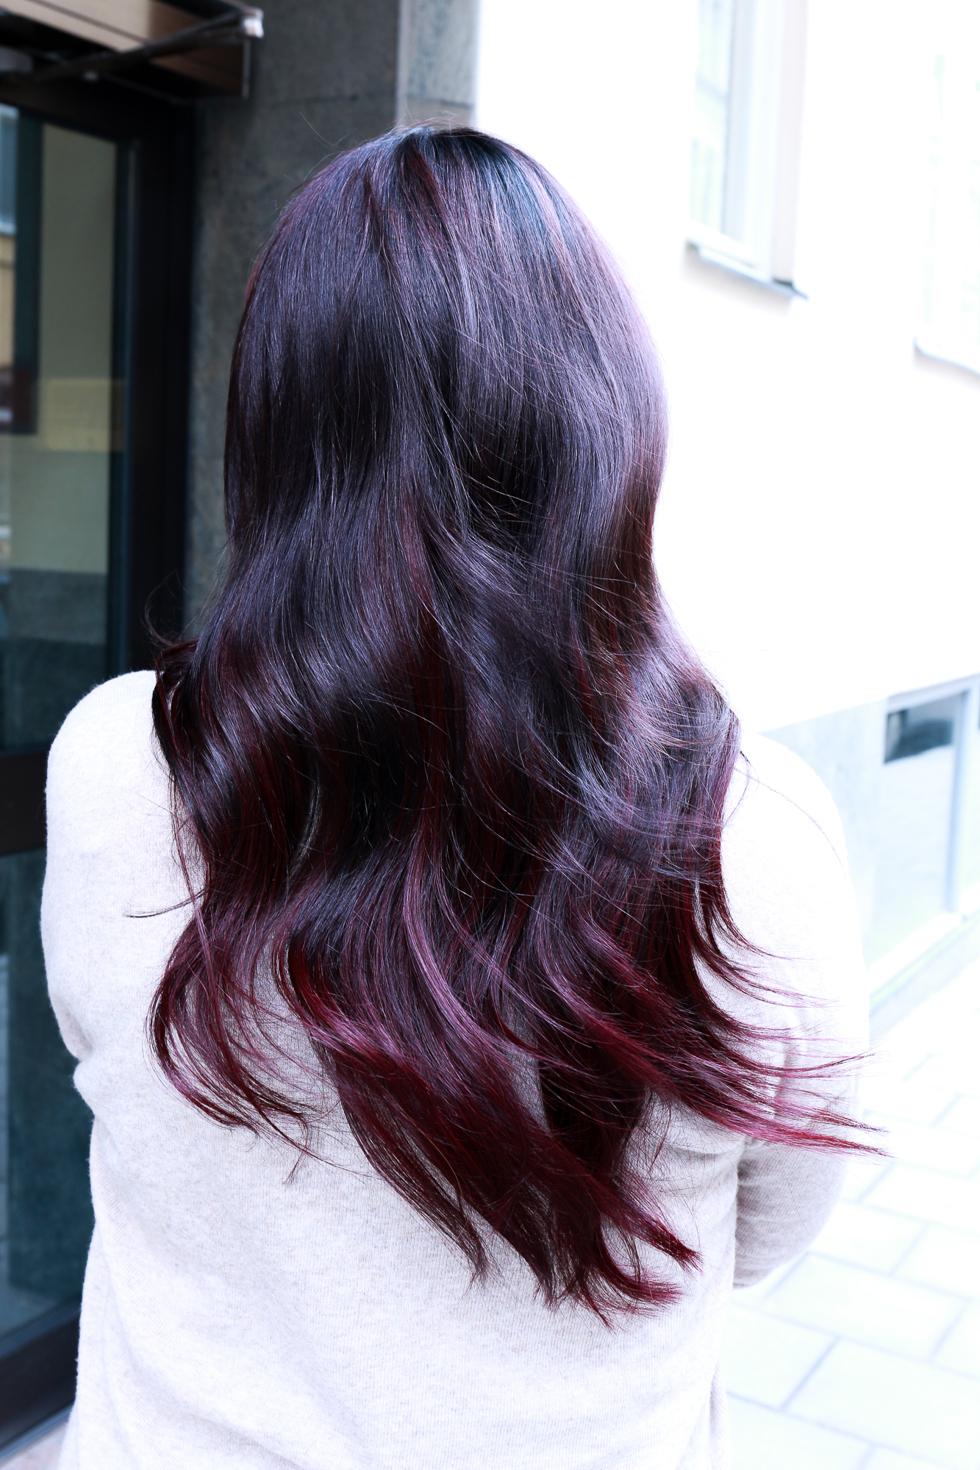 violetta hår